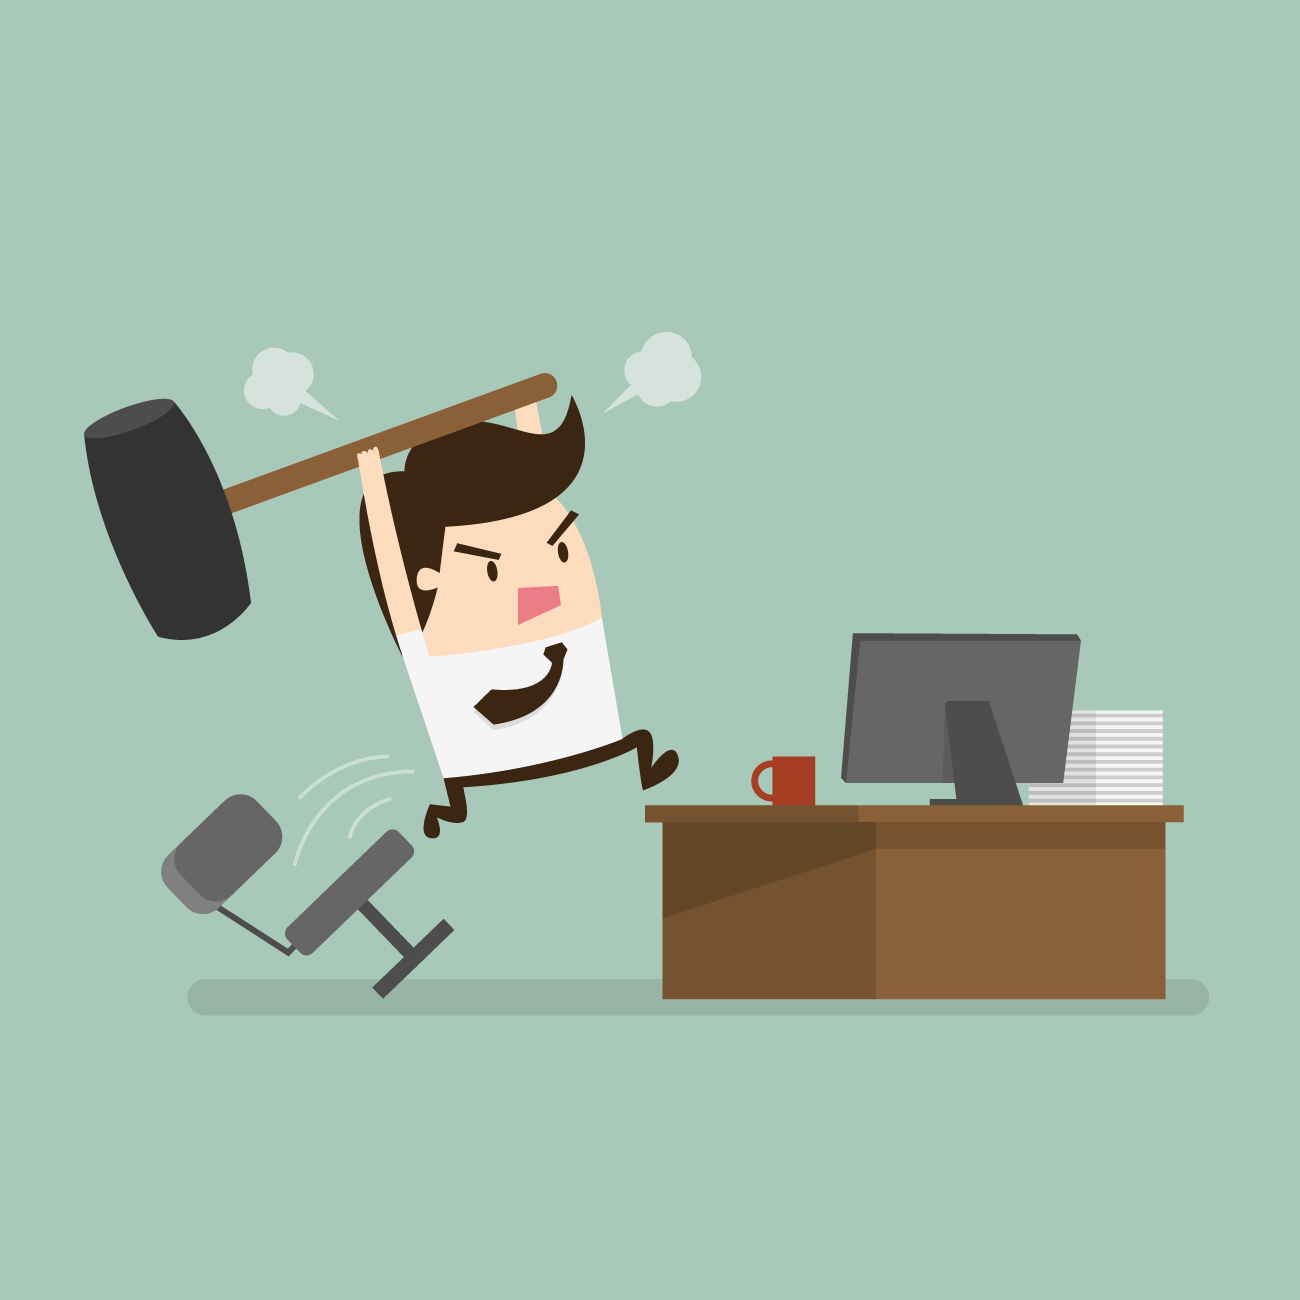 qual e a tua obra - estresse